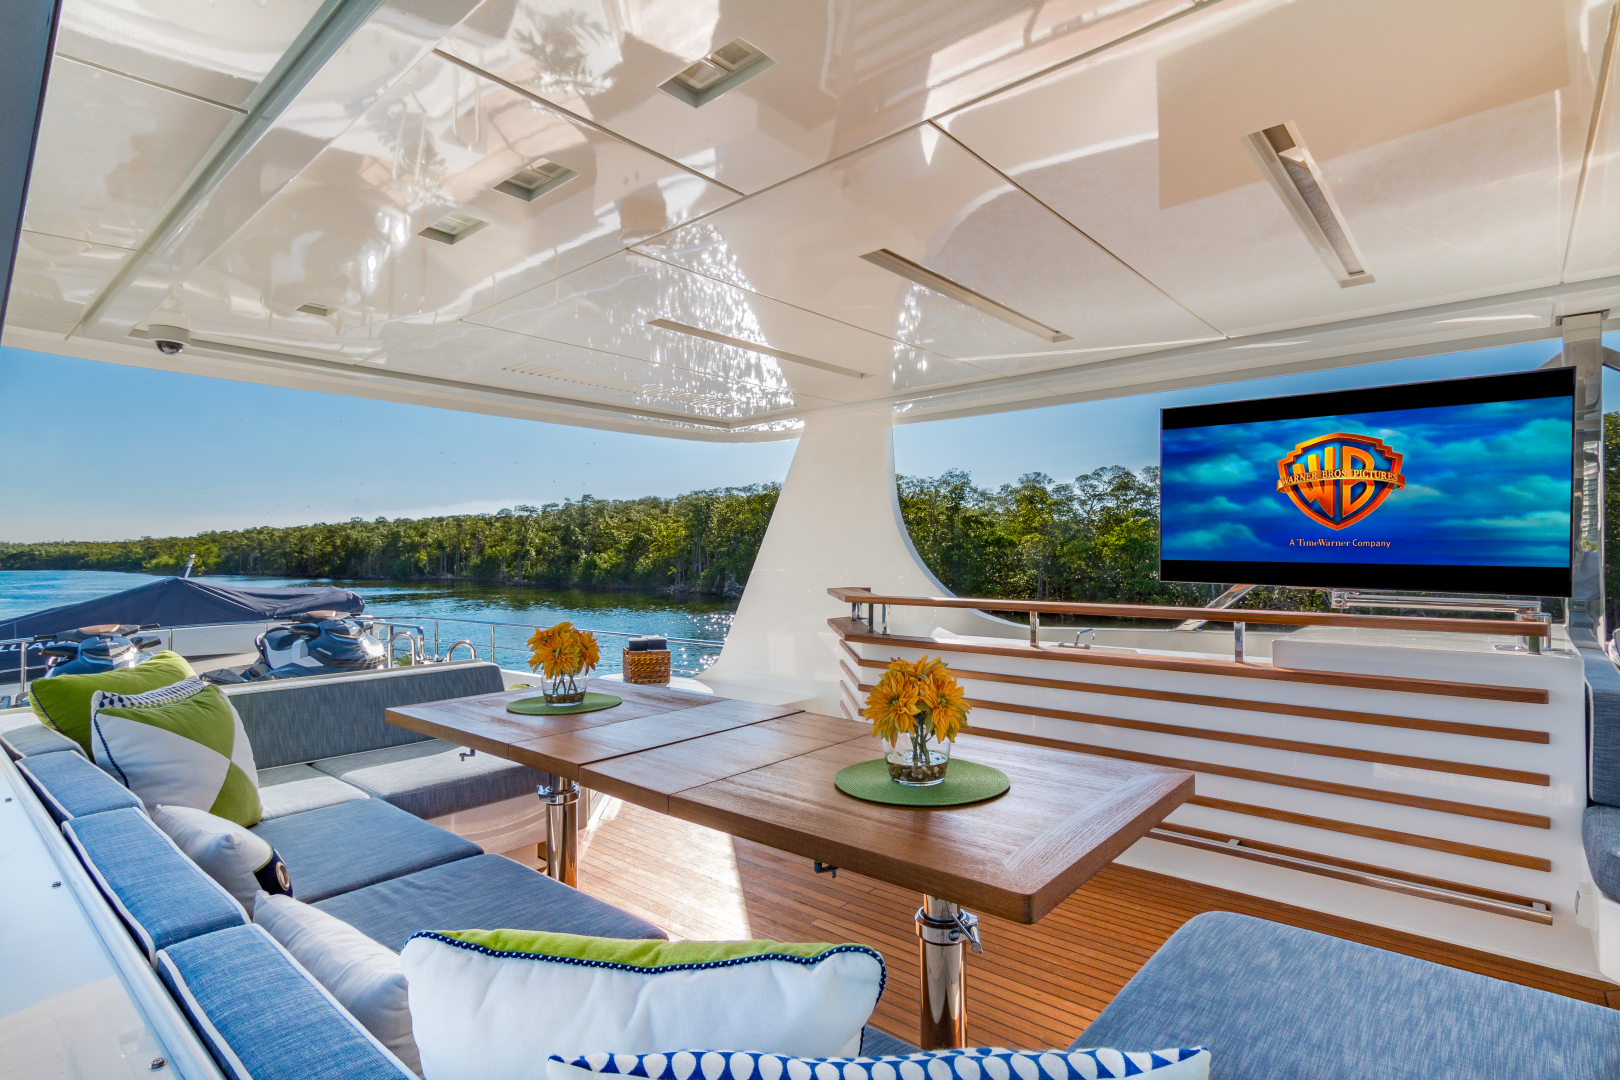 Vicem-Raised Pilot House 2013-MONI FORT LAUDERDALE-Florida-United States-SUN DECK DINING -1394885 | Thumbnail